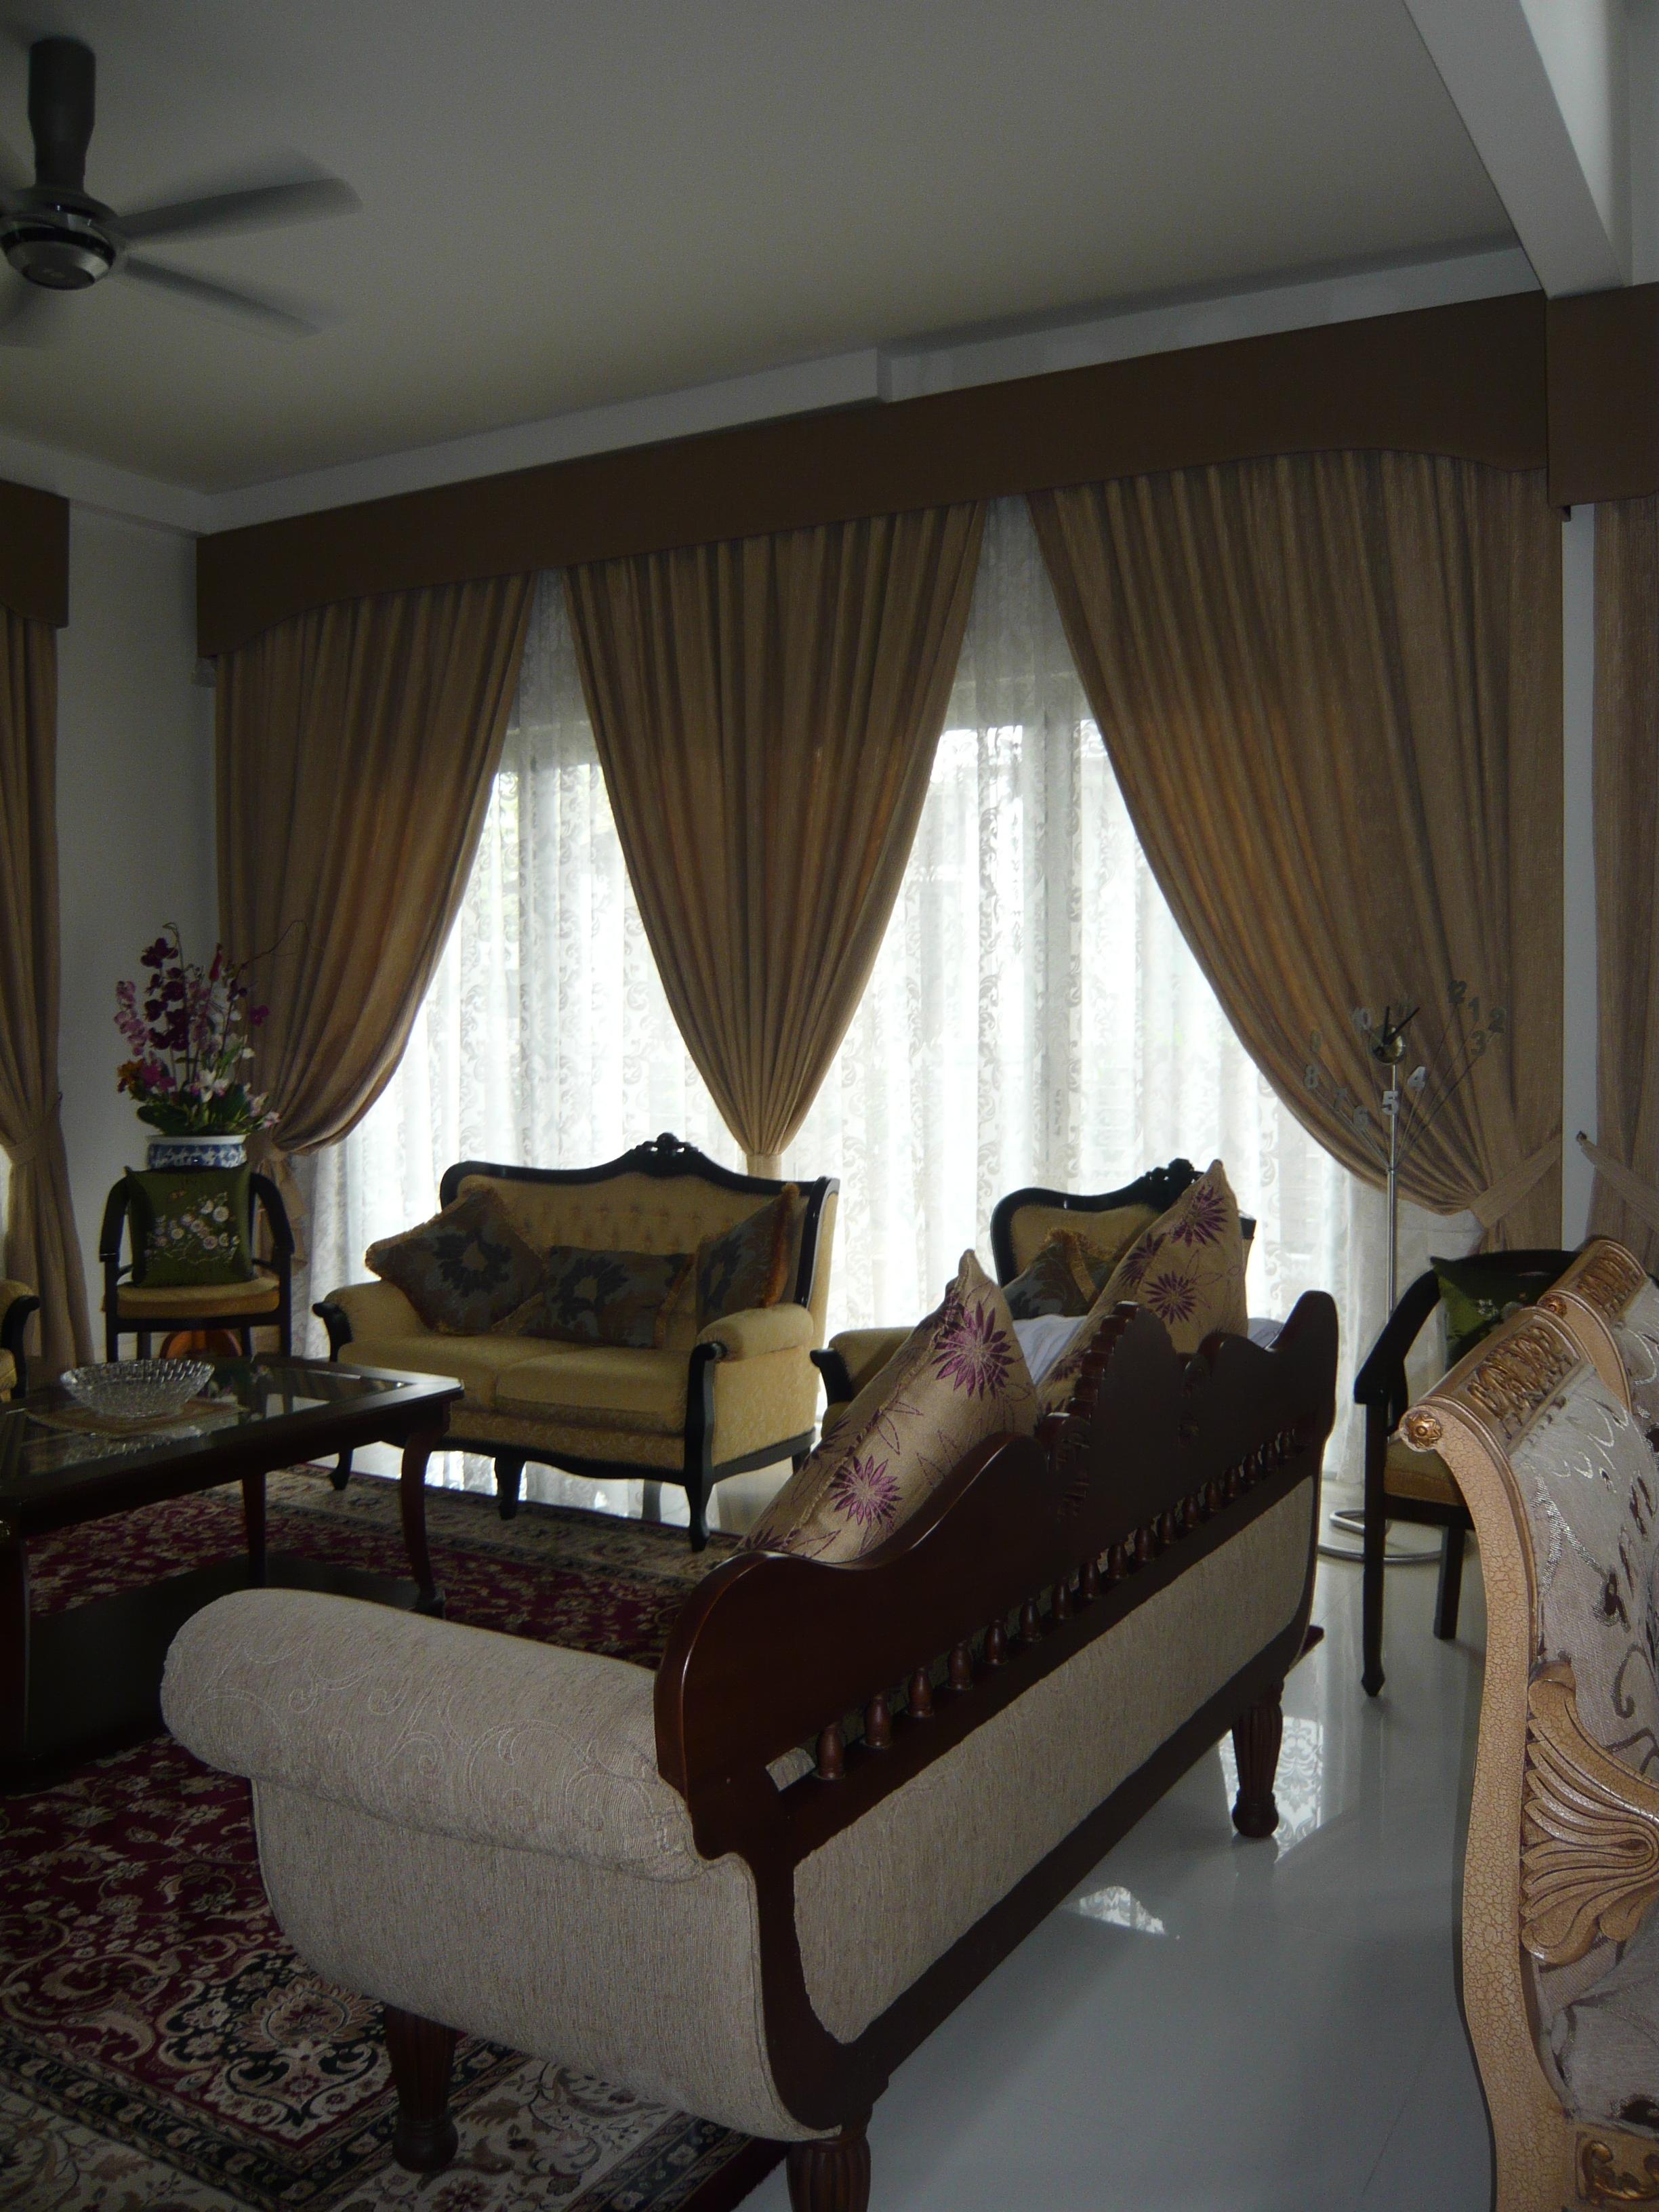 Laman Seri Bungalow Seksyen 13 , Shah Alam  Selangor